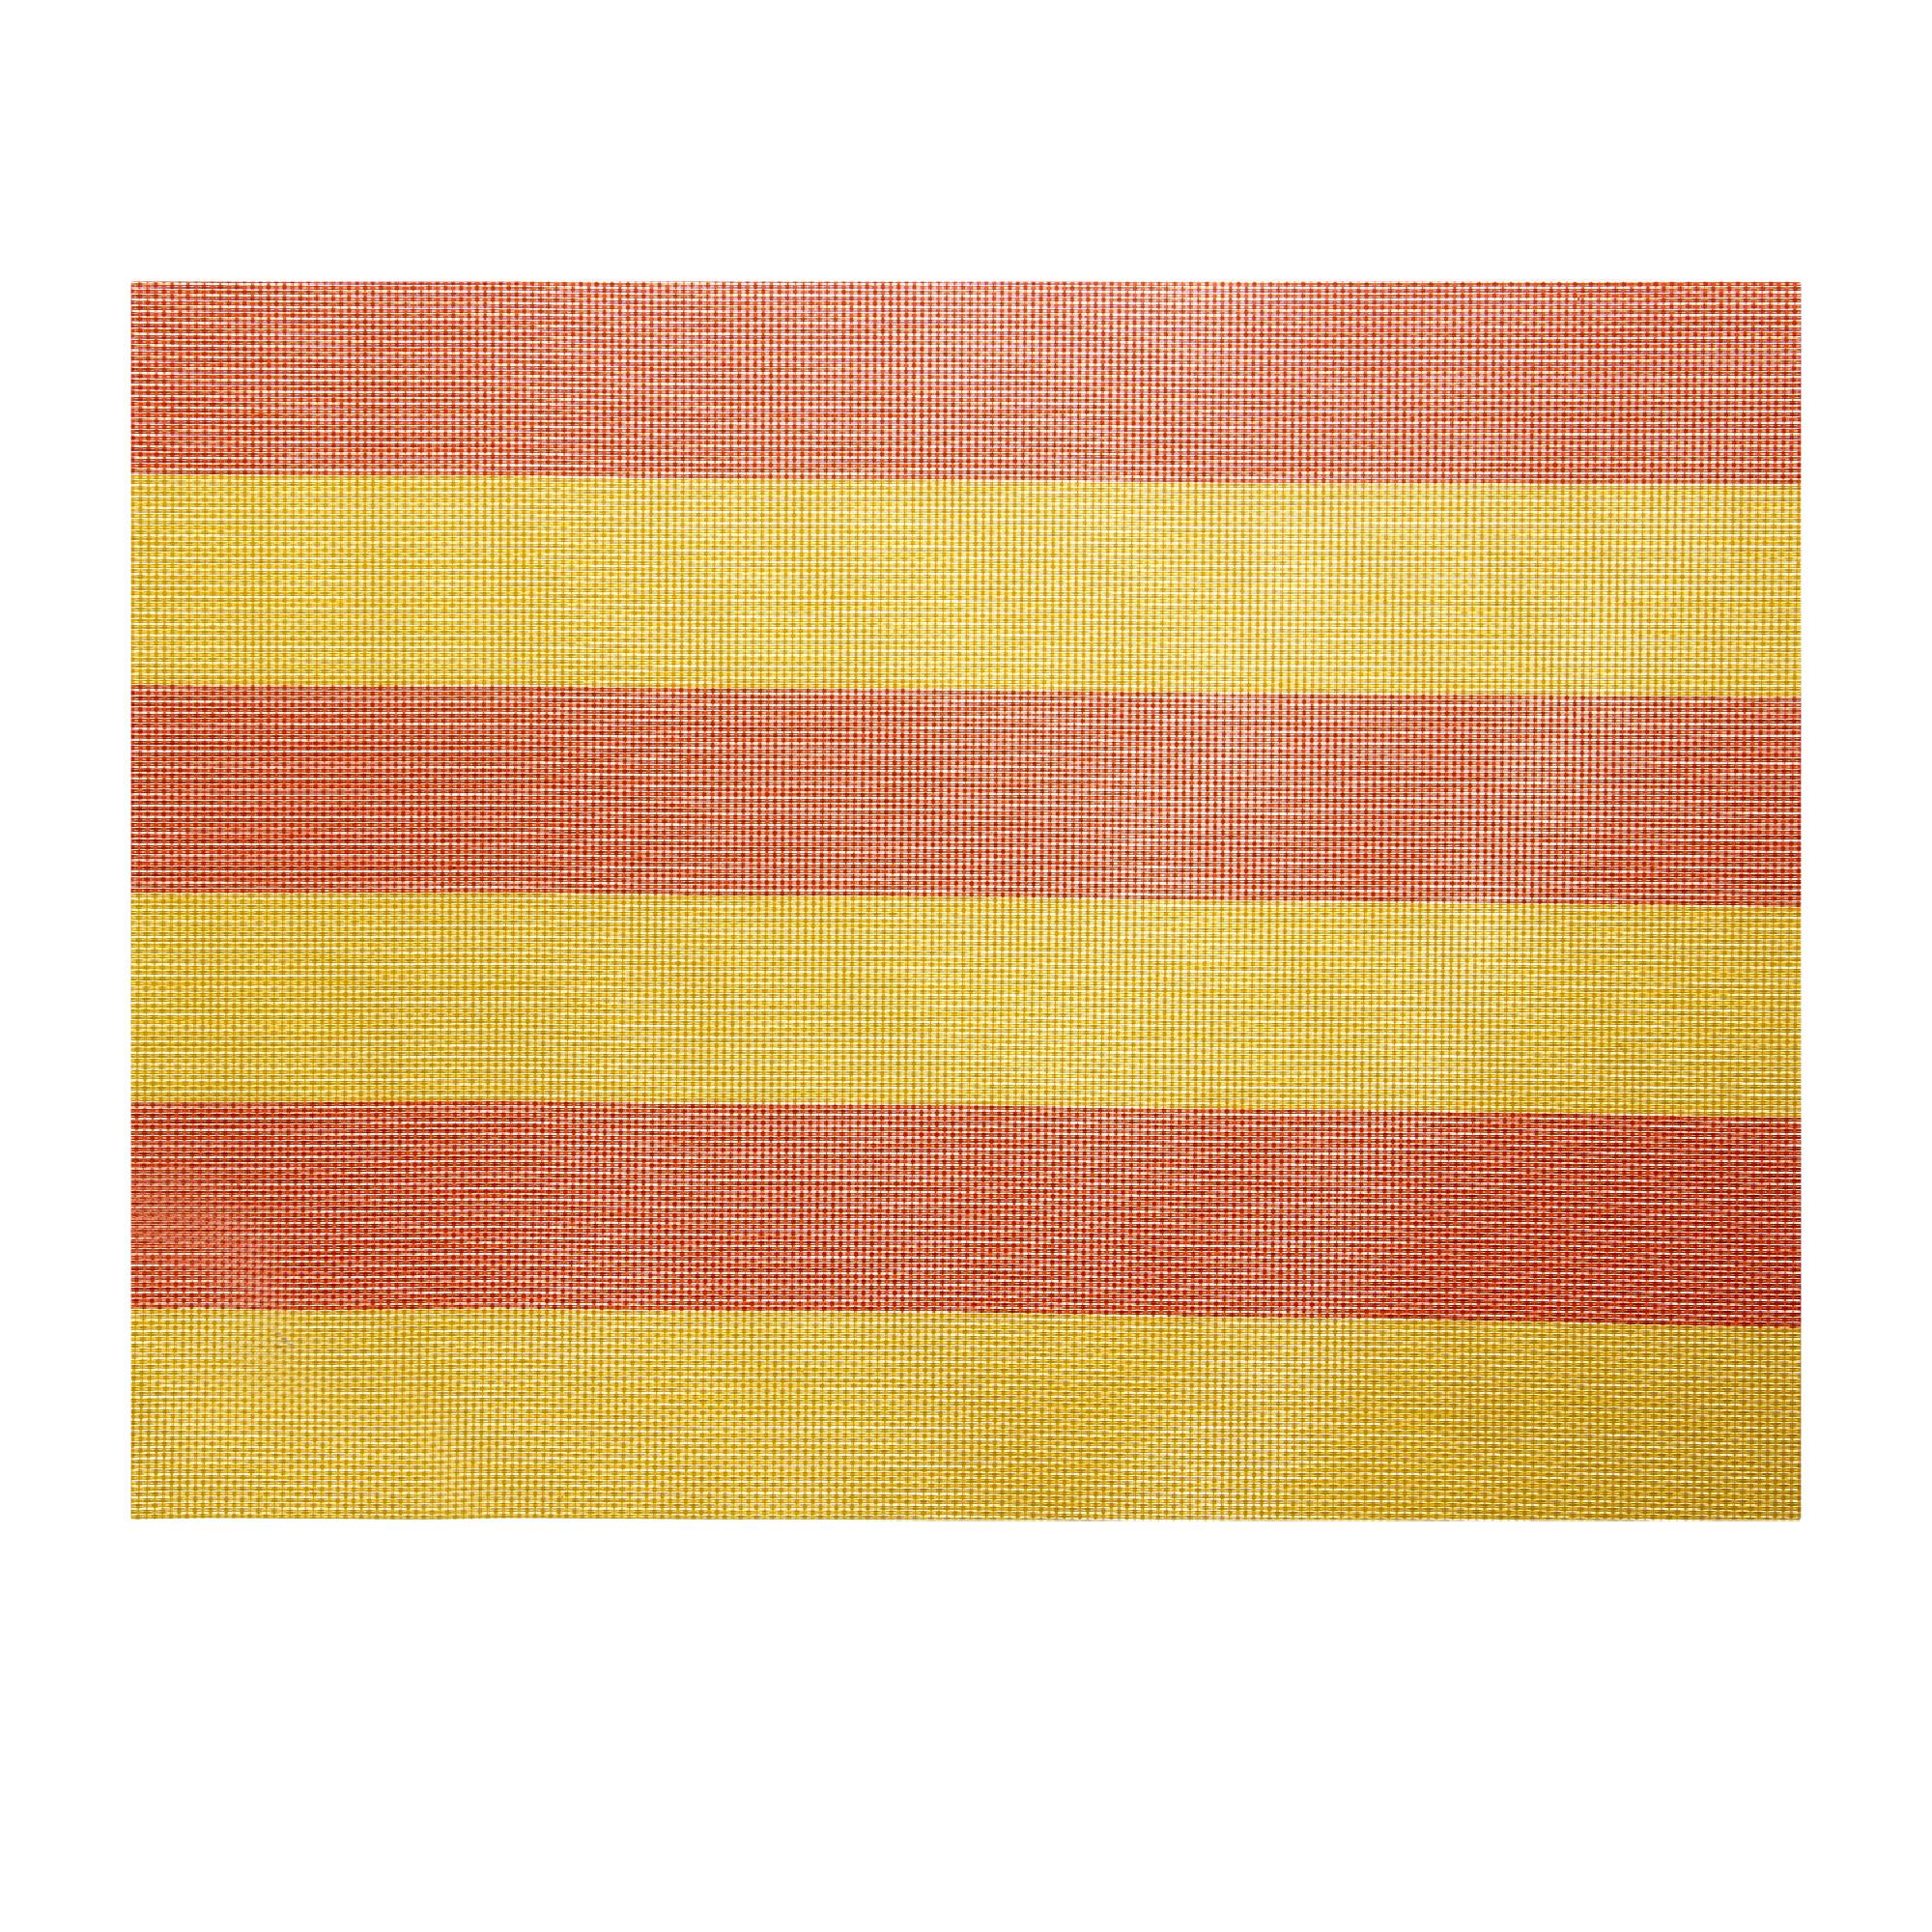 Фото - Салфетка под посуду Asa selection 33х46см оранжевая/желтая салфетка под посуду asa selection tabletops 46x33 см